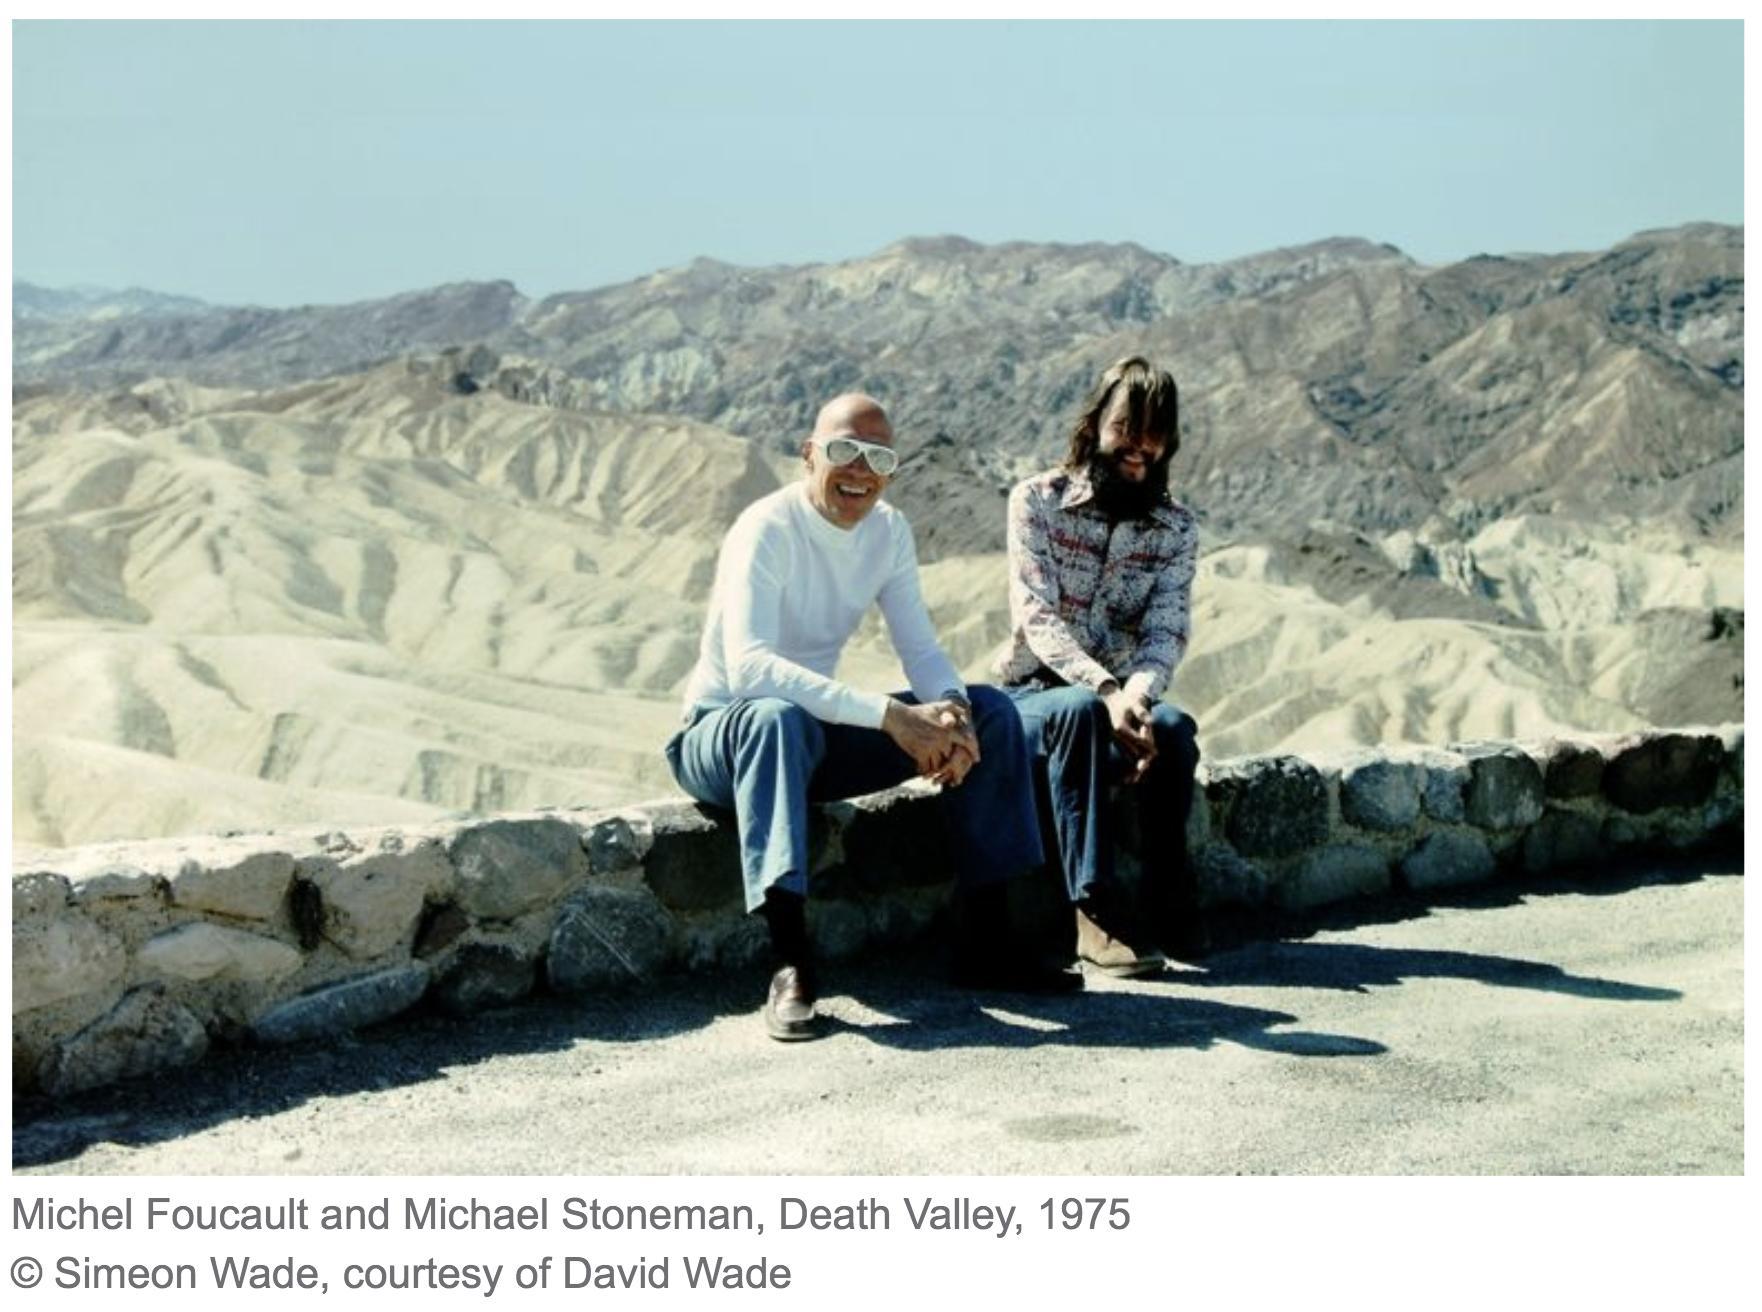 Michel Foucault in death valley…